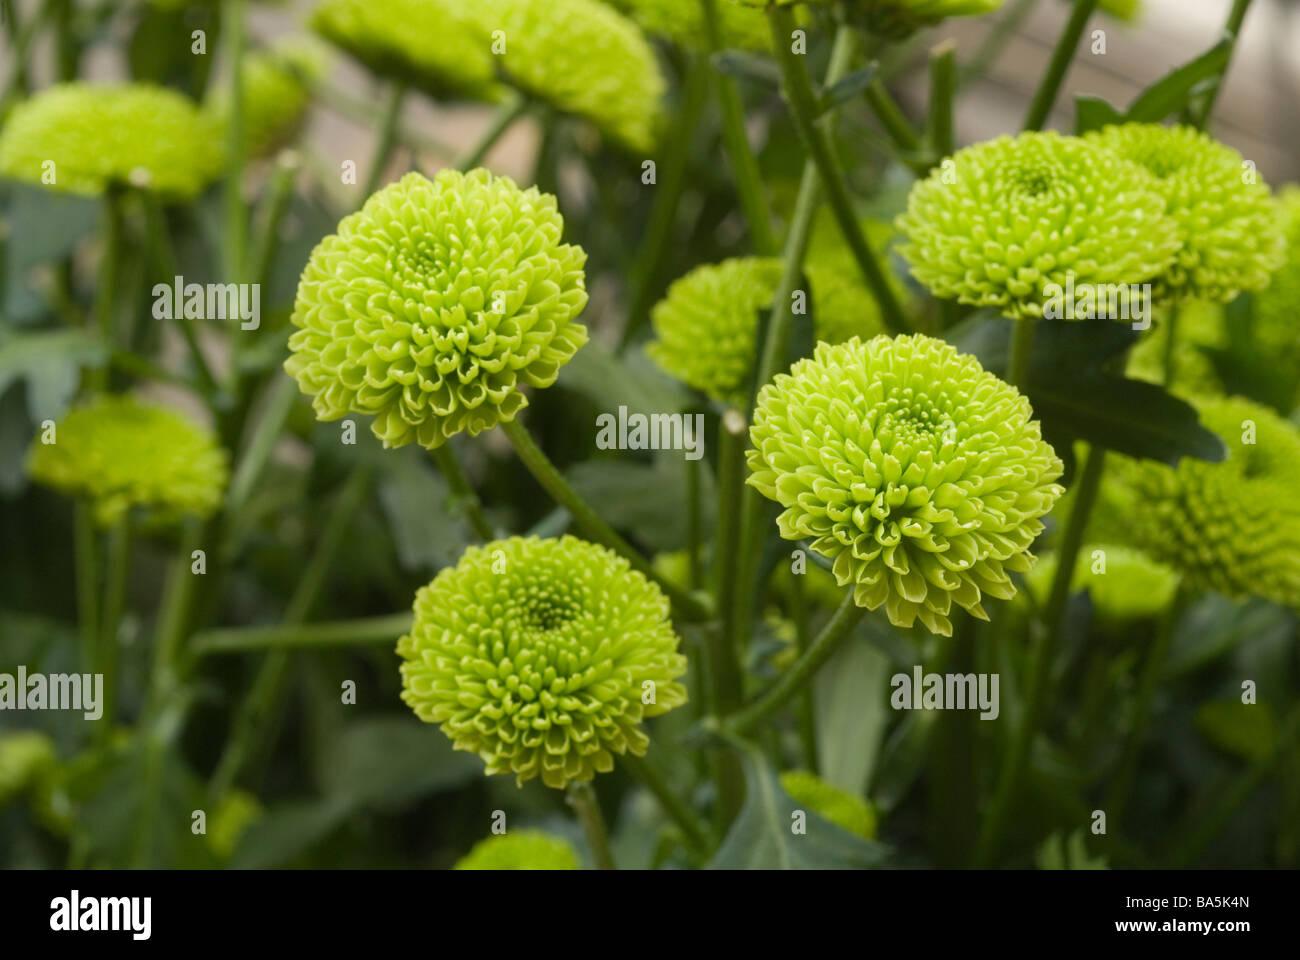 Top Chrysanthemum Indicum Stock Photos & Chrysanthemum Indicum Stock @TH_97